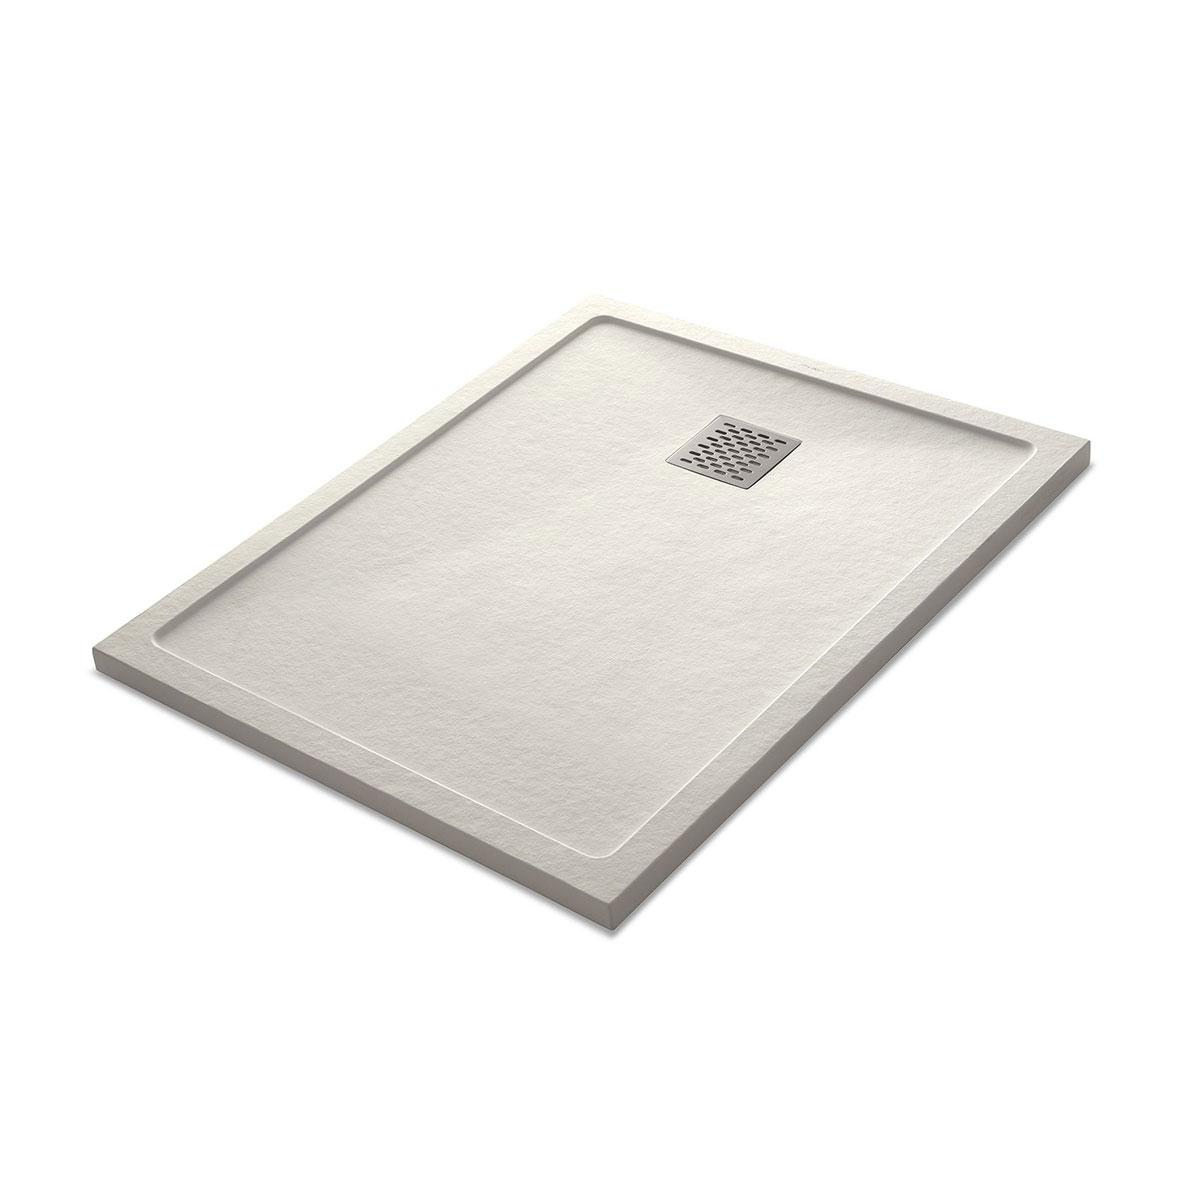 Plato de ducha rectangular 100x80 Ares Stone Nox Beige